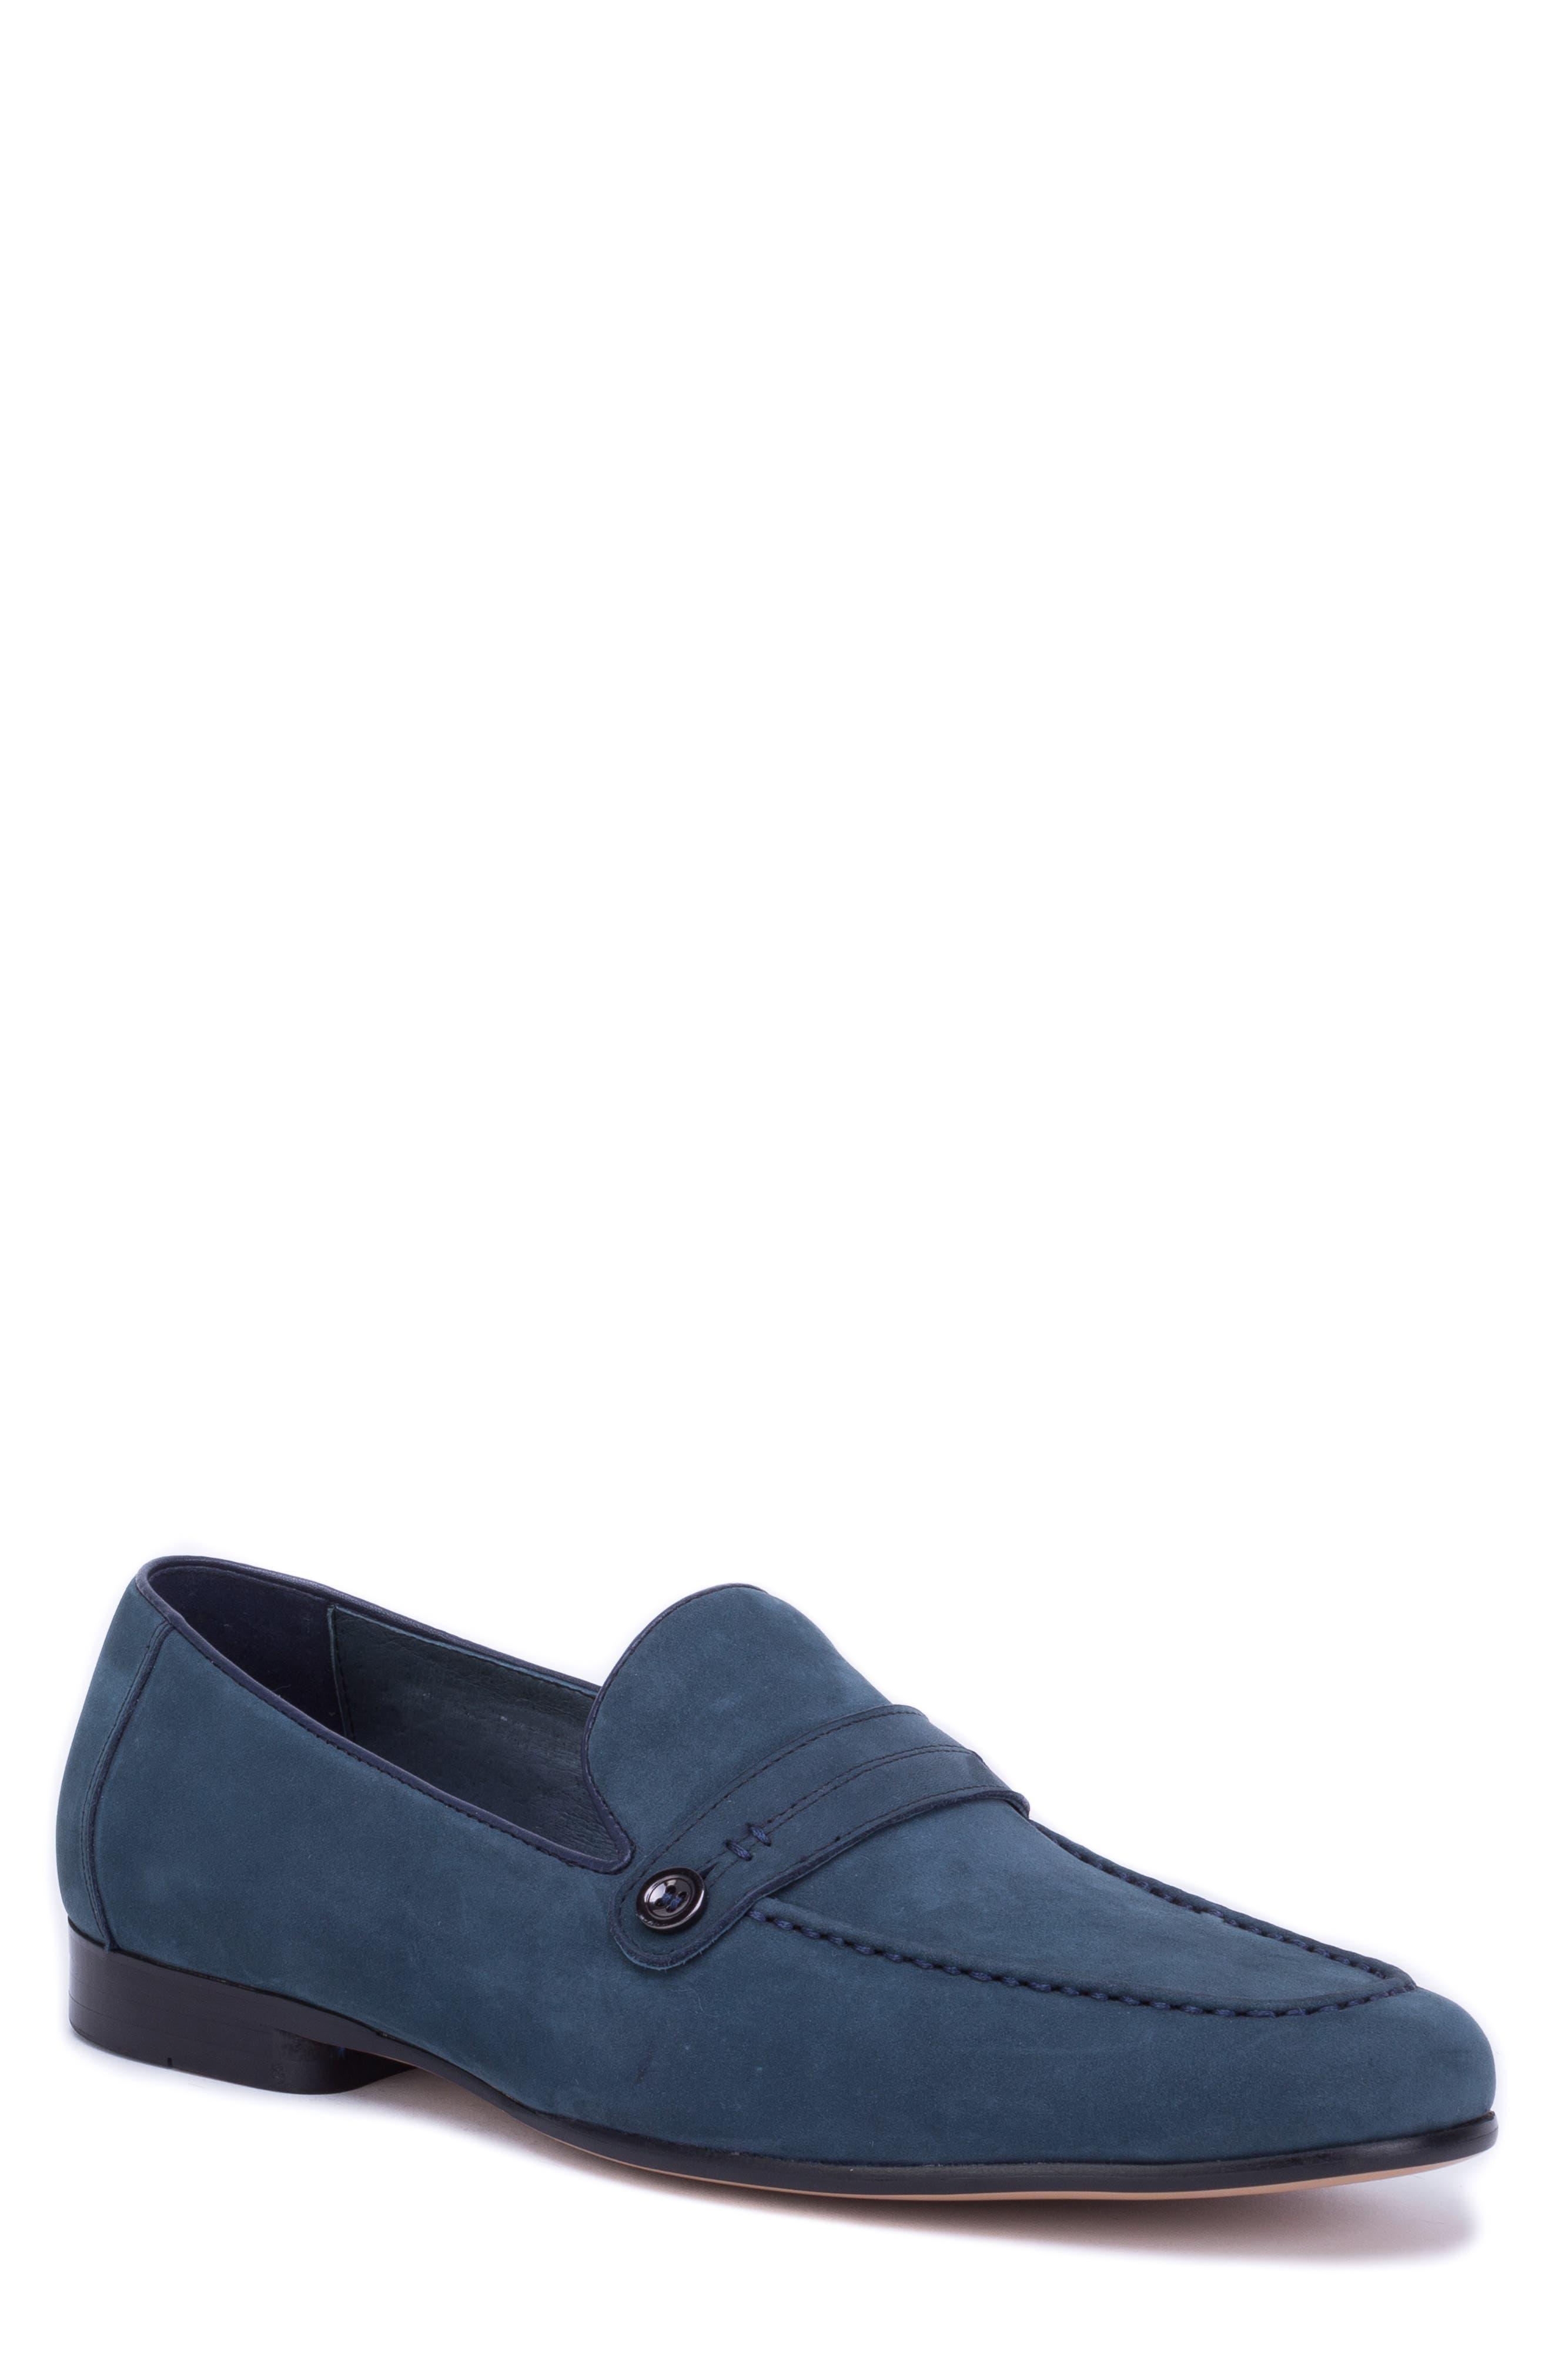 Robert Graham Norris Button Loafer, Blue